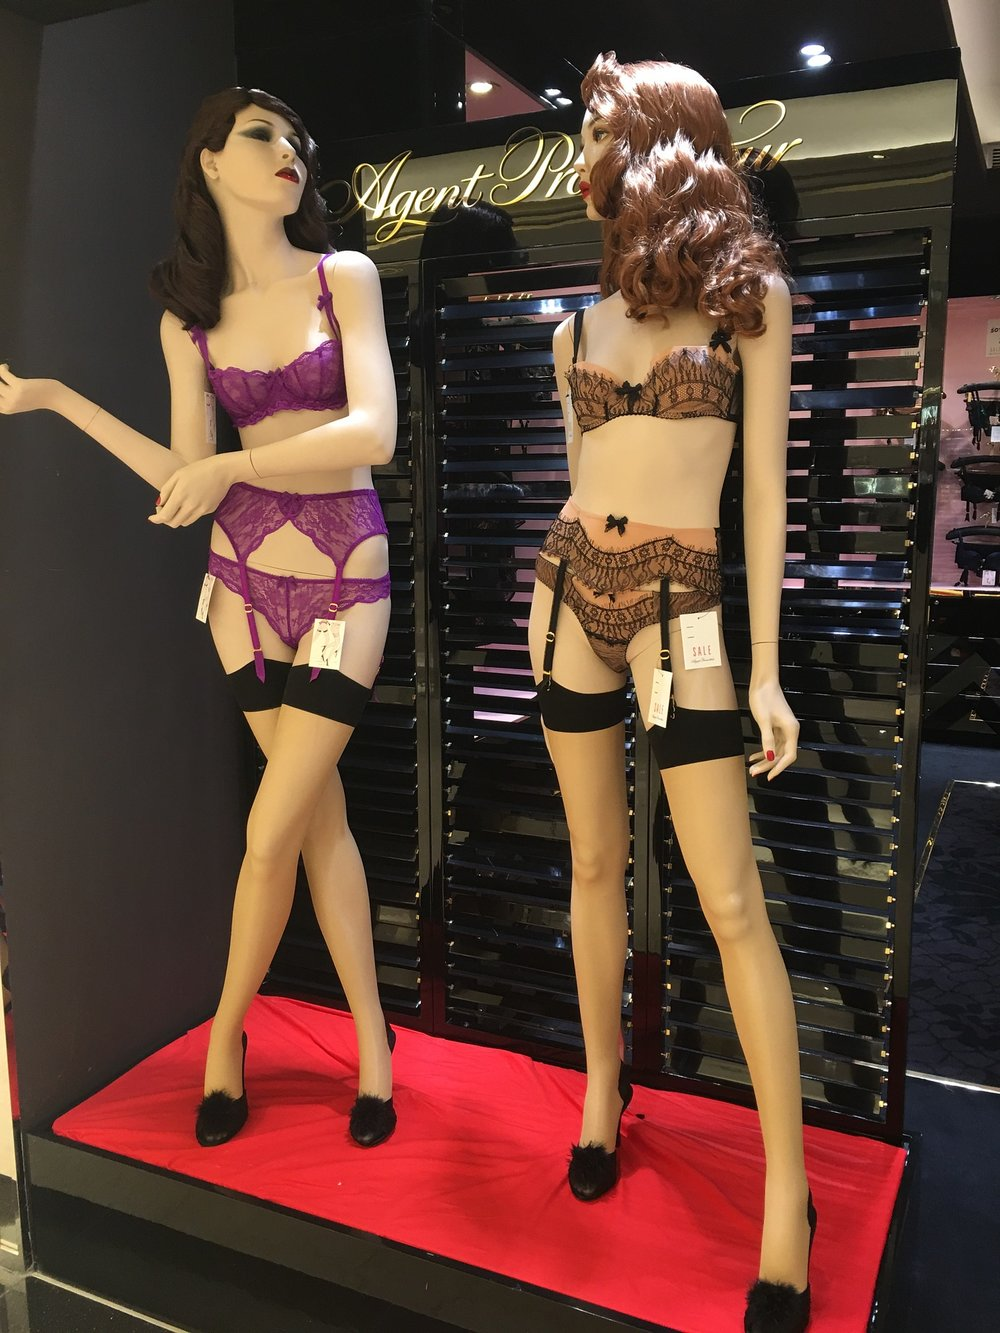 sex-toys-1303974_1920.jpg